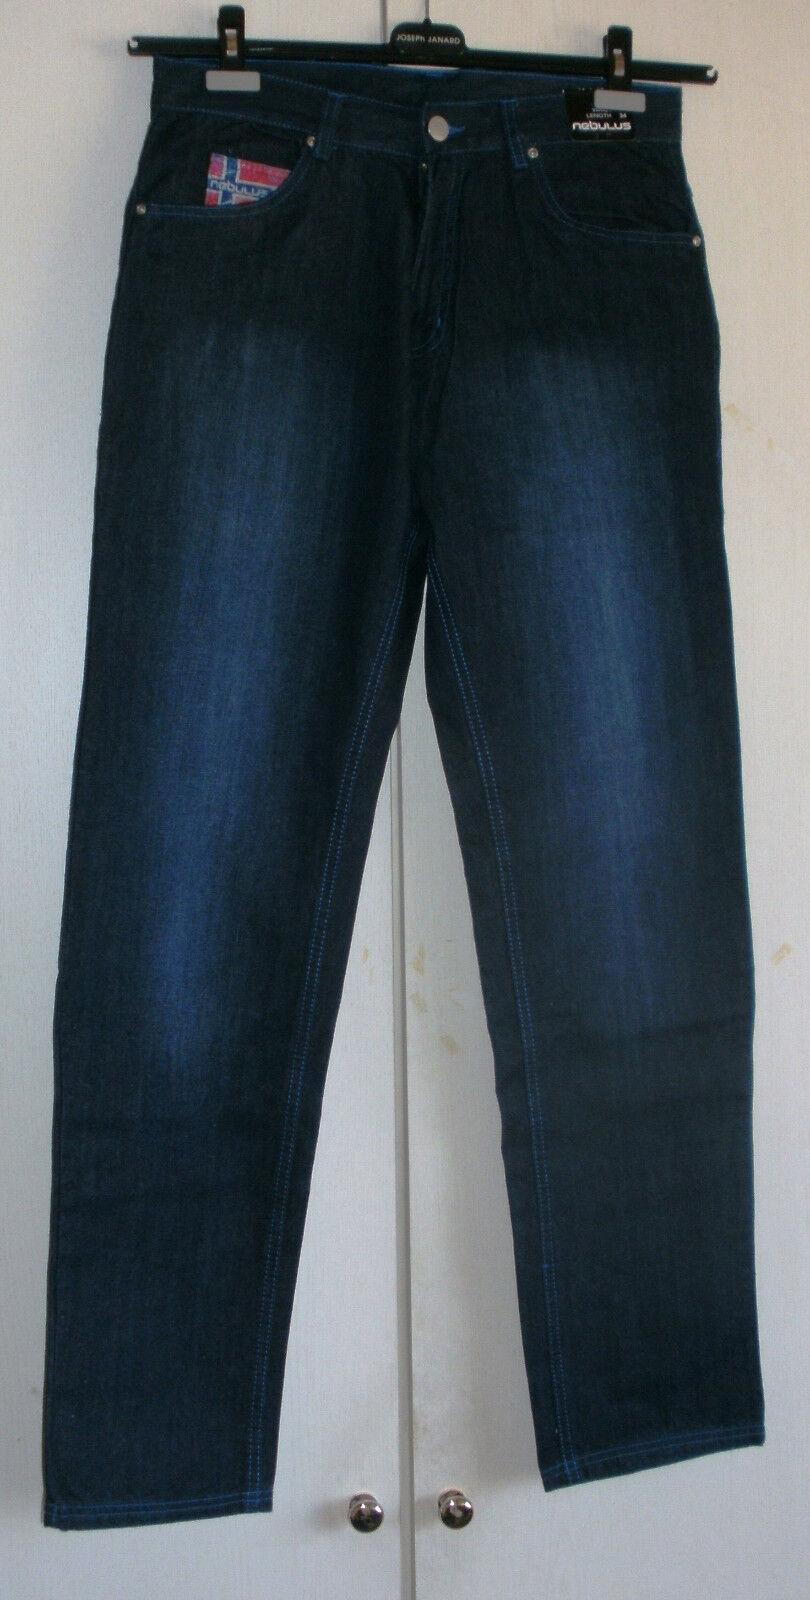 NUOVA Nebulus Uomo Jeans Pantaloni Dean regular Cut, w33 l34; NP